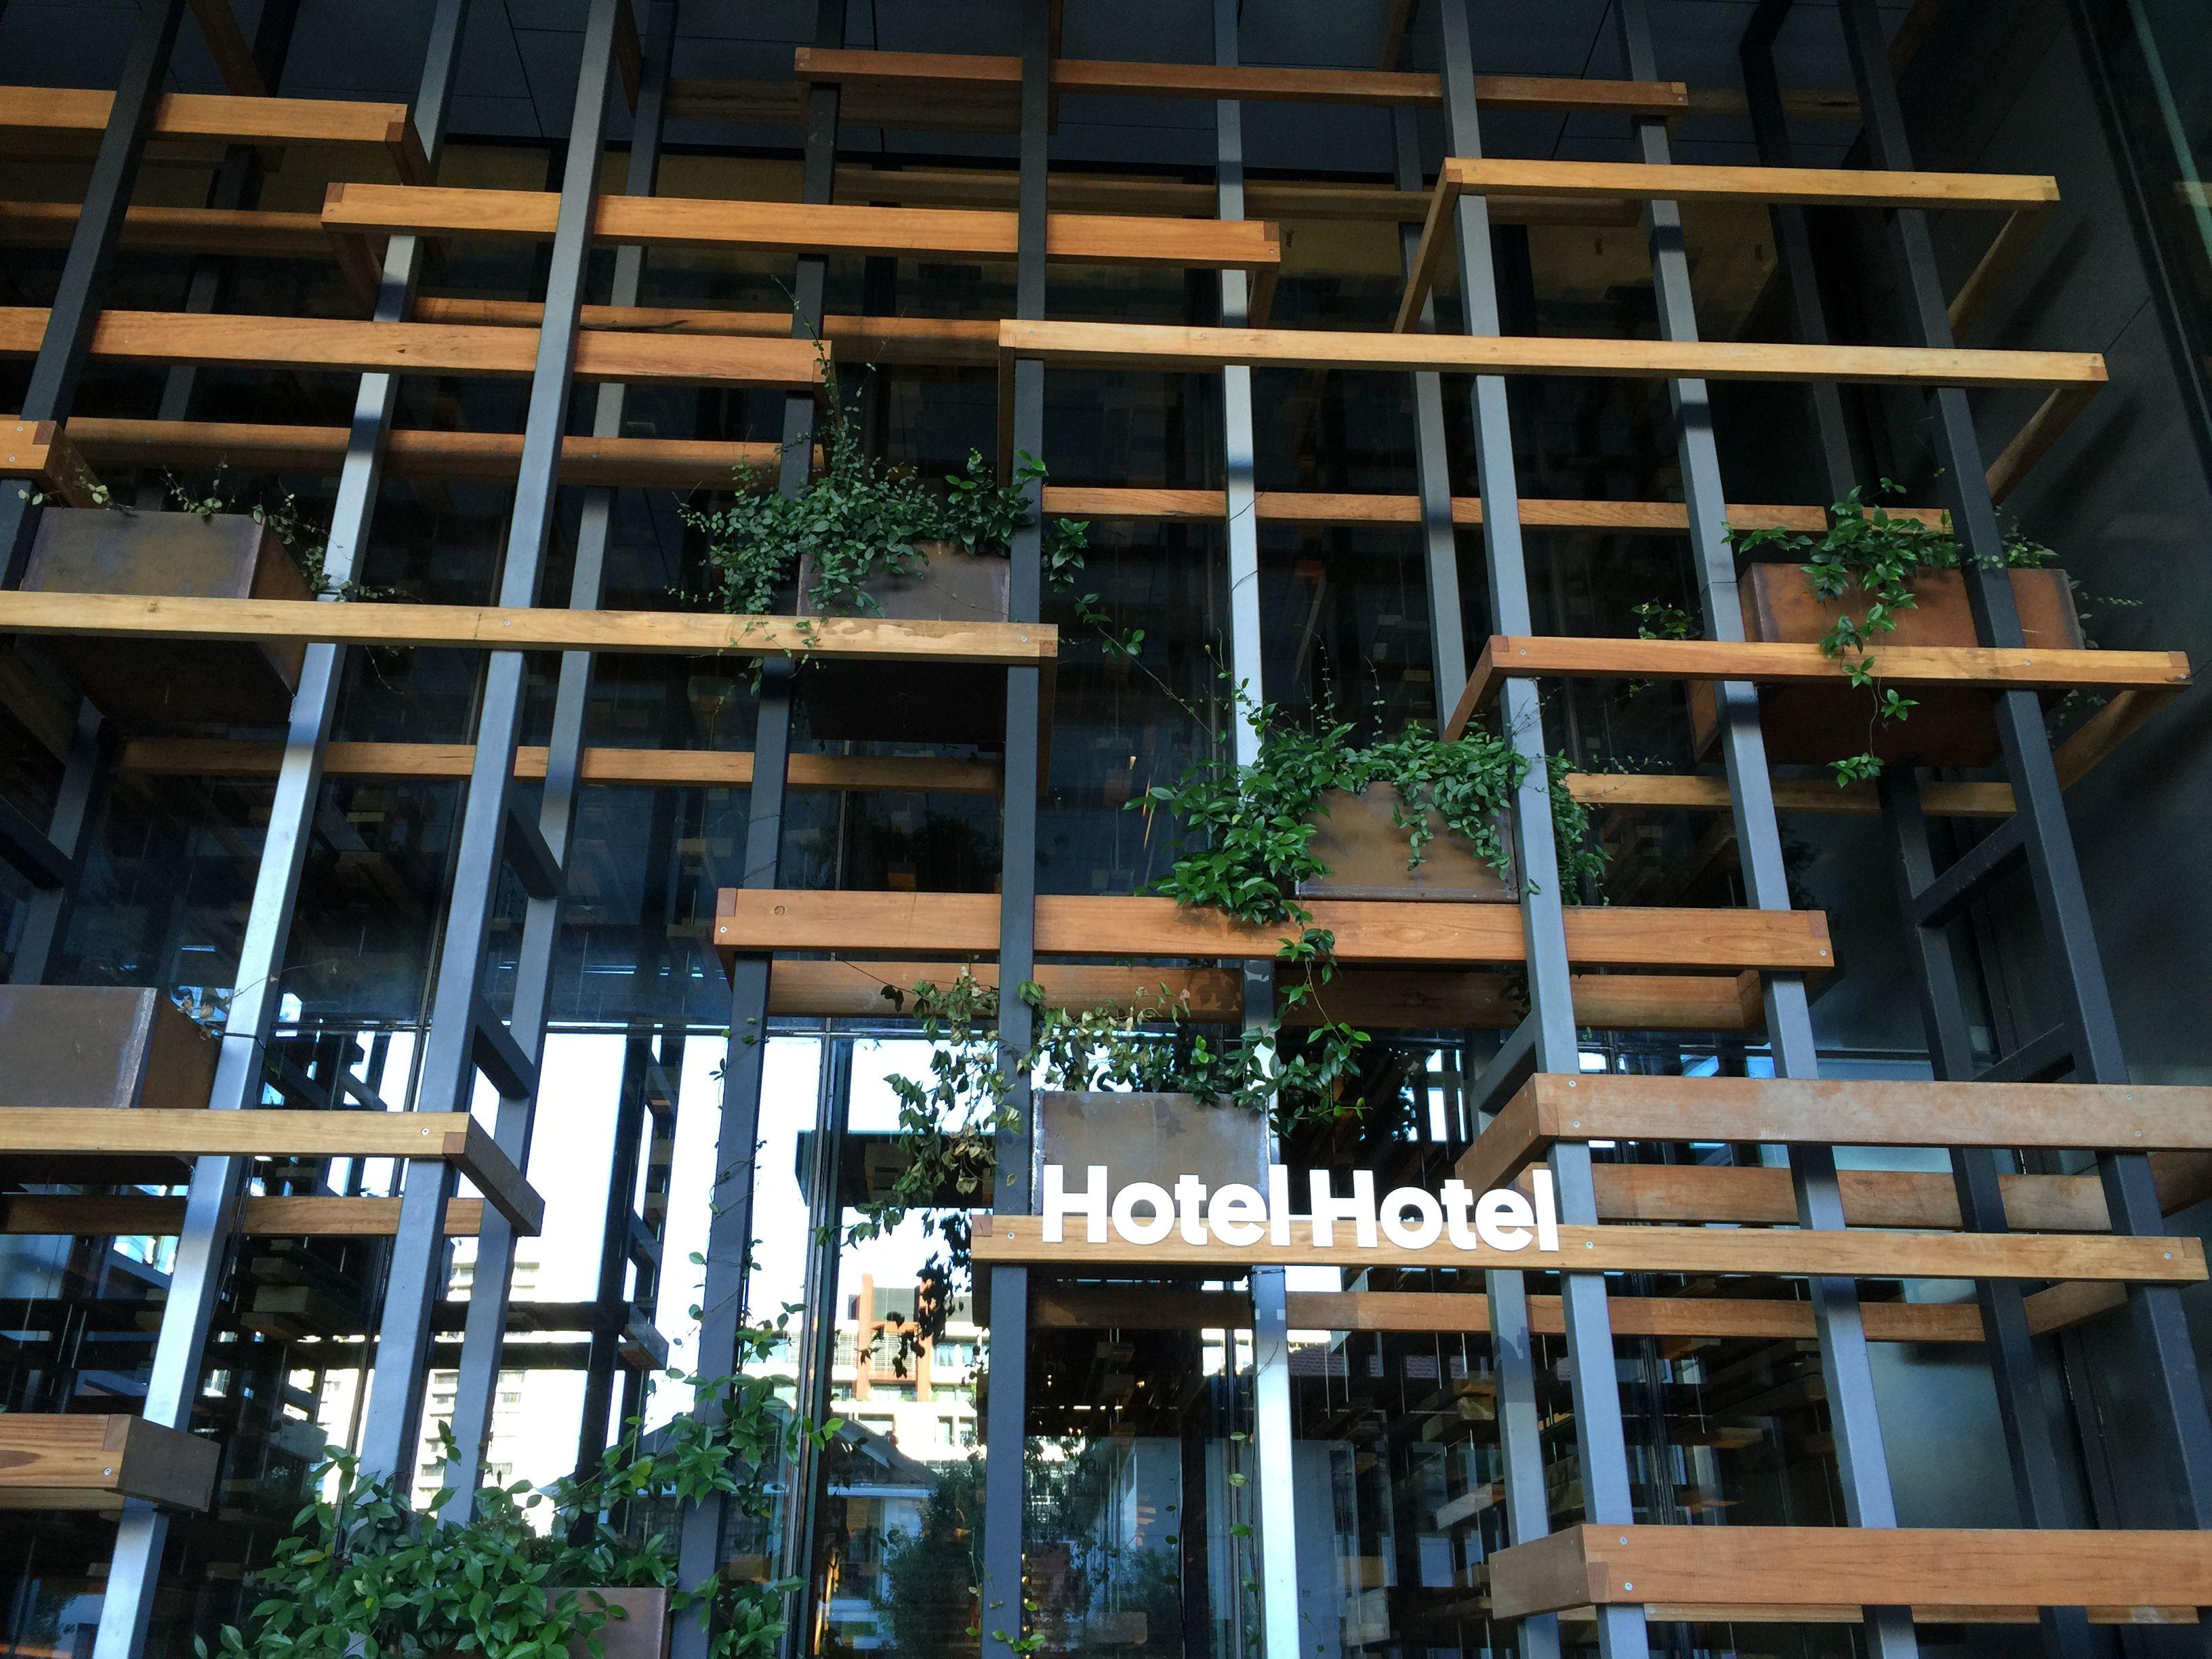 Hospitality Design, Hotel, Facade